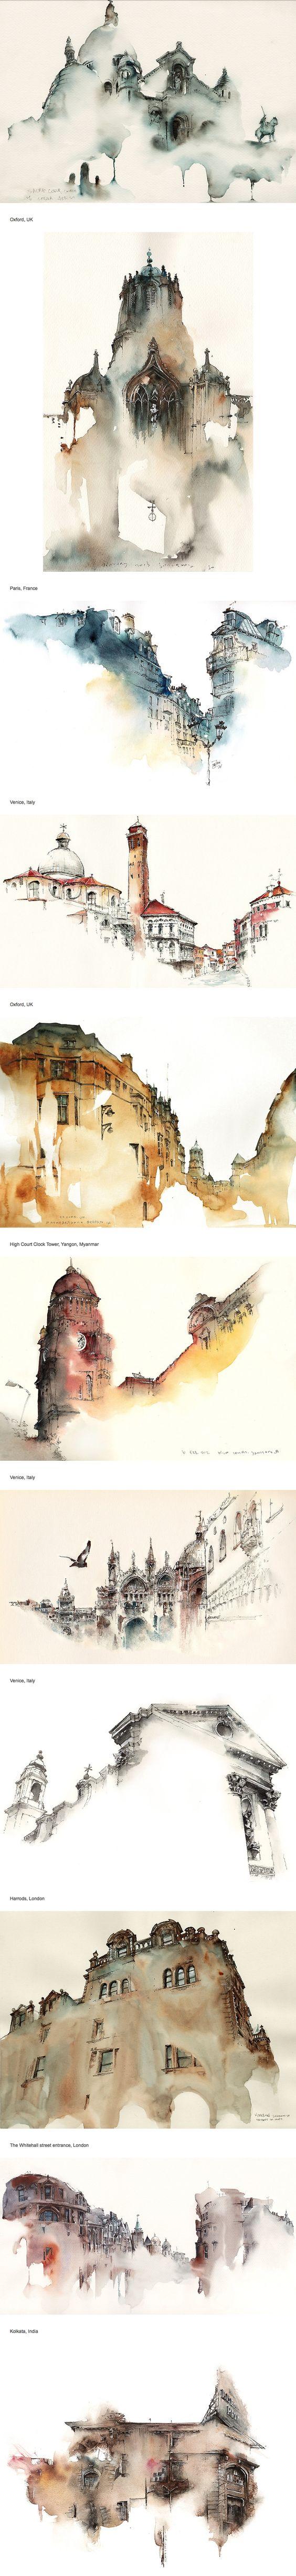 WOW NICE WORK.... Elusive Architecture in Watercolors of Korean Artist Sunga Park